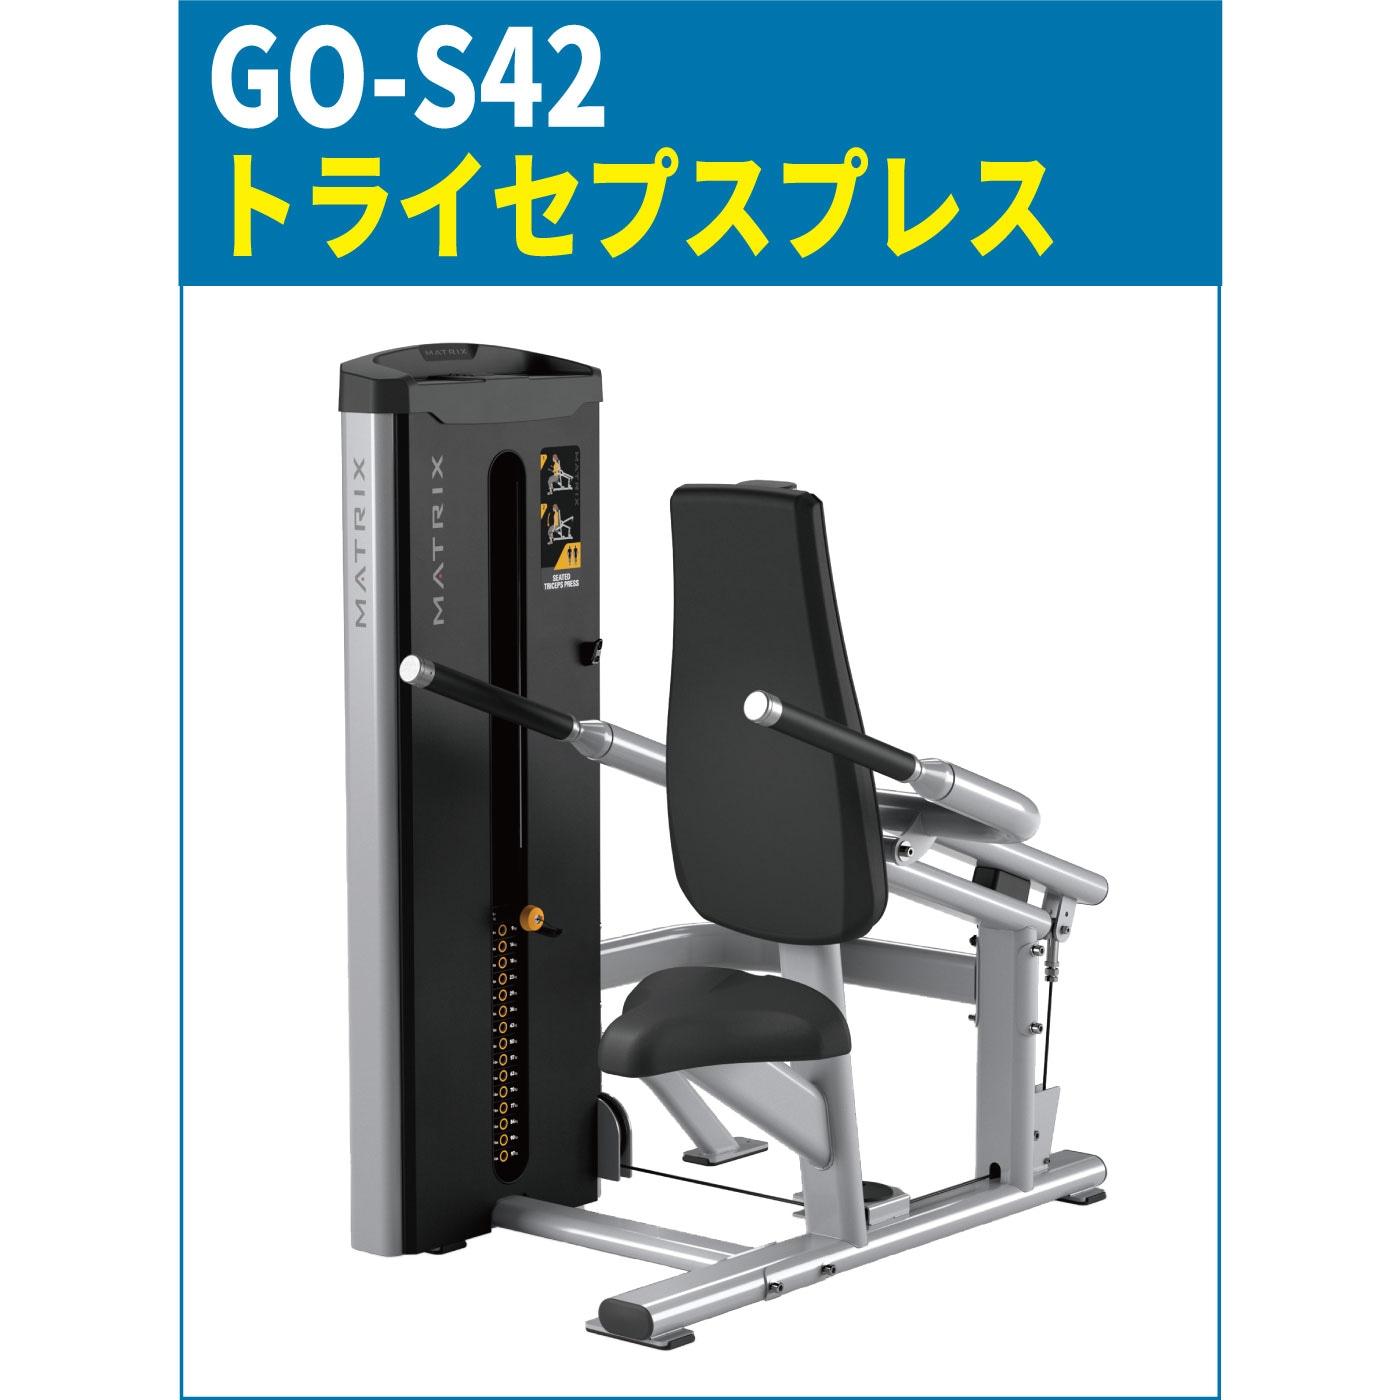 GO-S42のトライセプスプレス